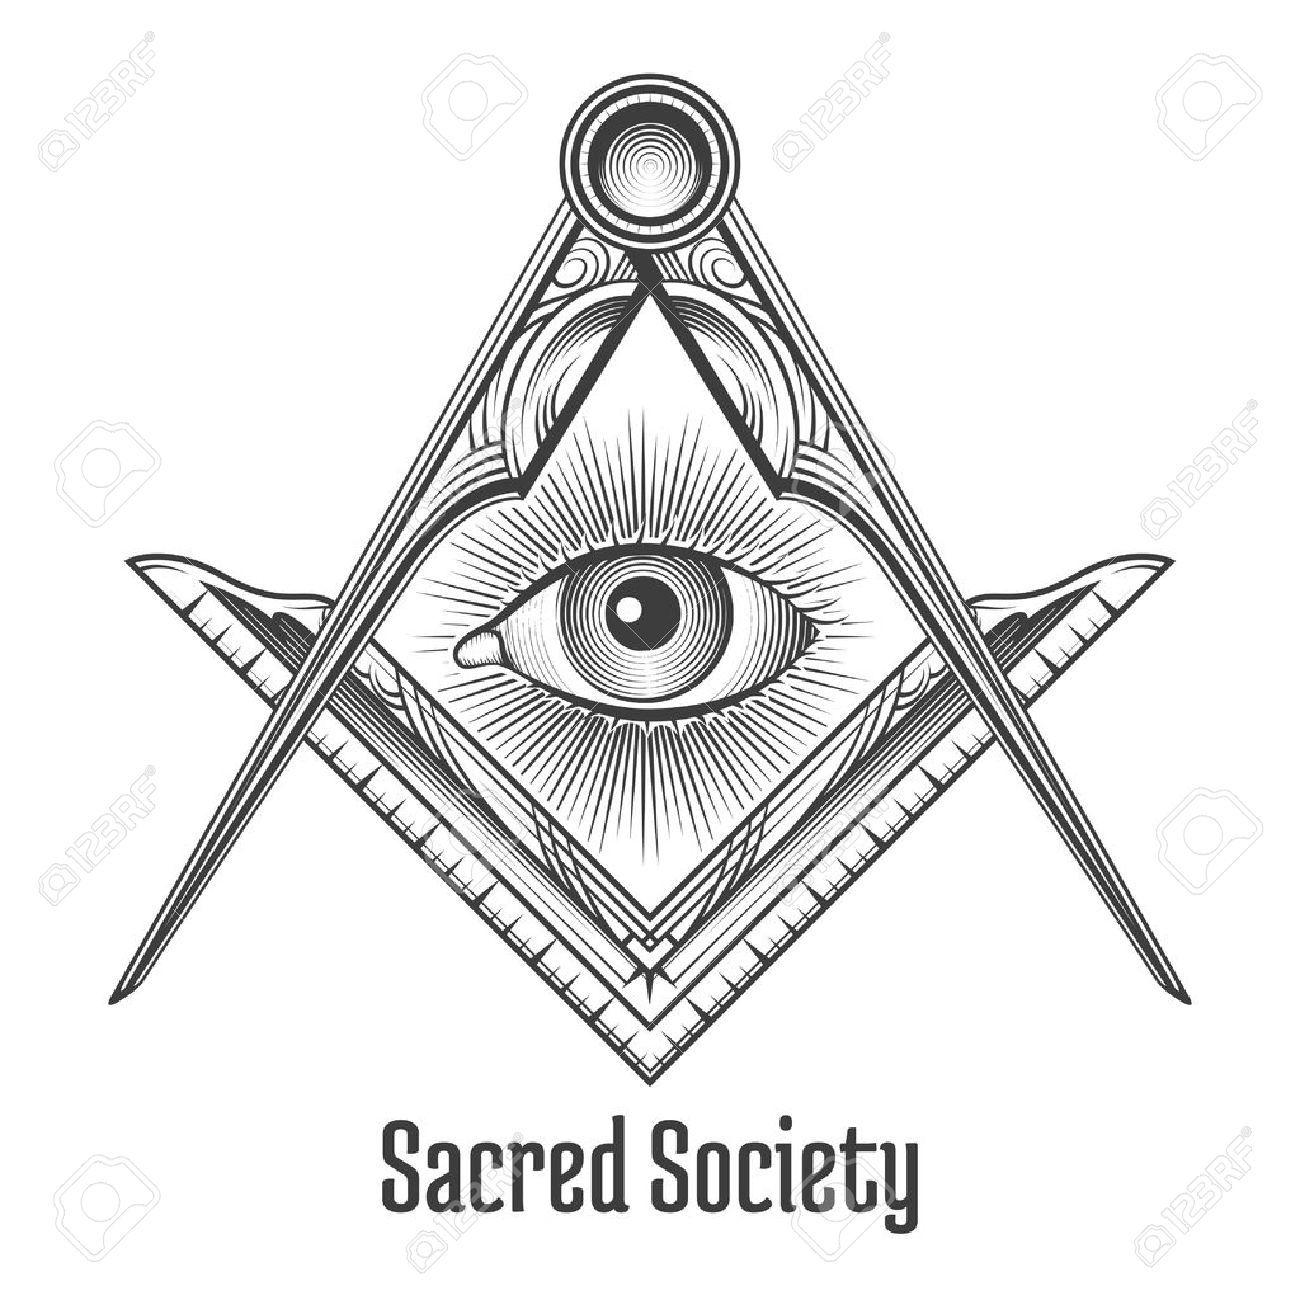 Stock Vector Masonic symbols, Compass symbol, Symbols